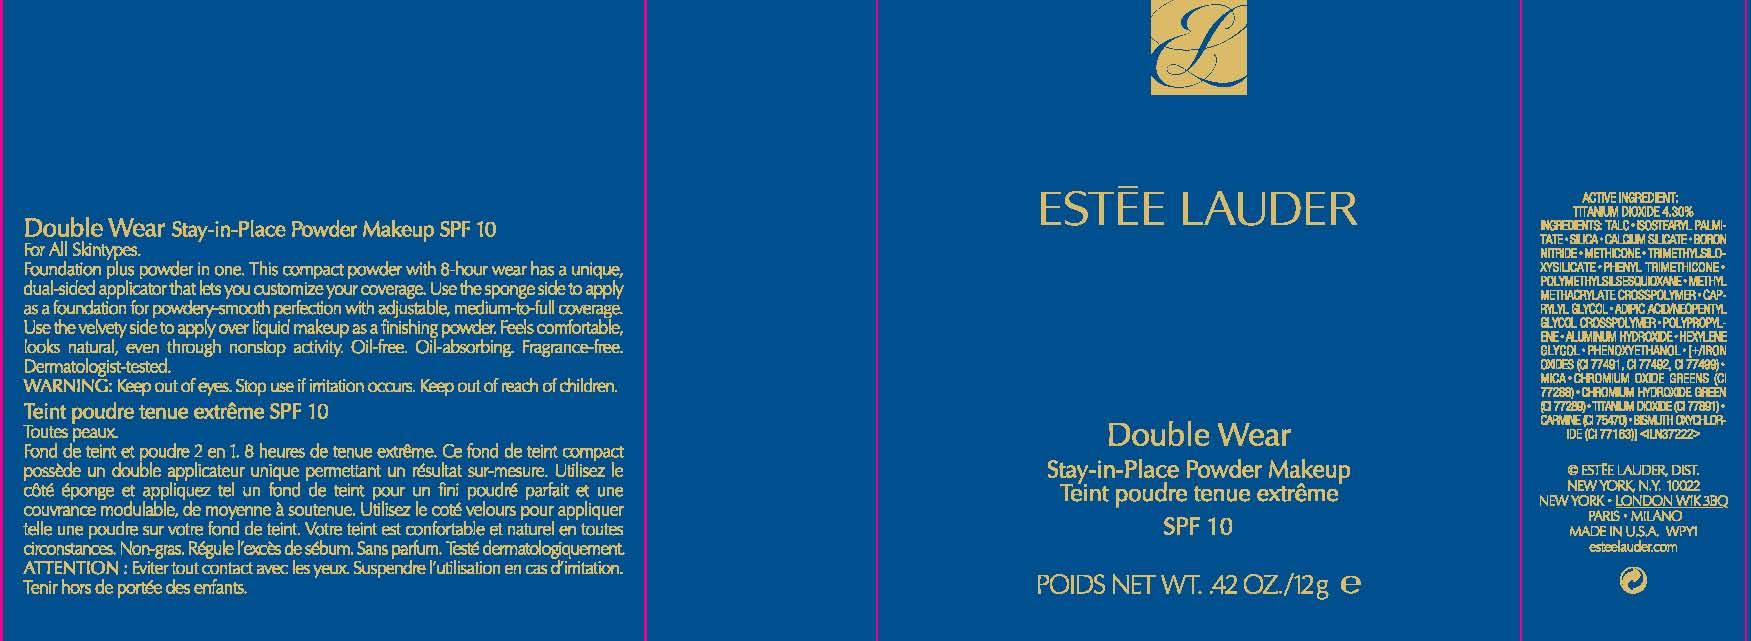 Double Wear Stay In Place Spf 10 Makeup (Titanium Dioxide) Powder [Estee Lauder Inc]